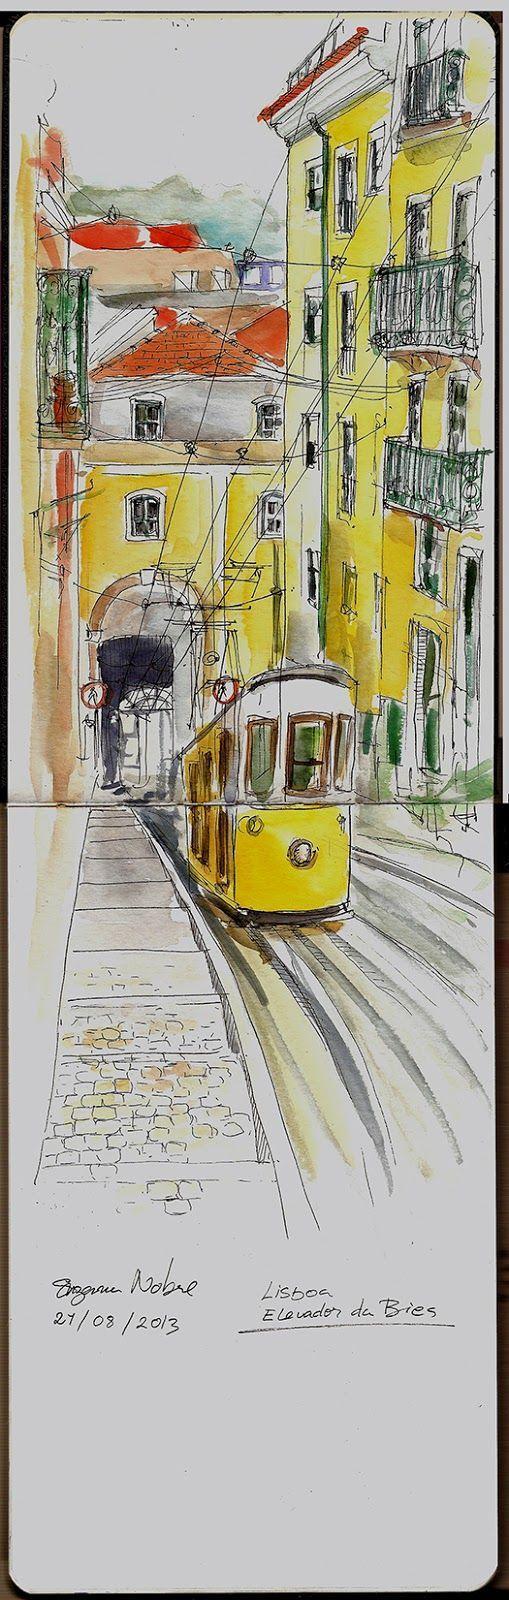 Urban Sketchers Portugal: Elevador da bica